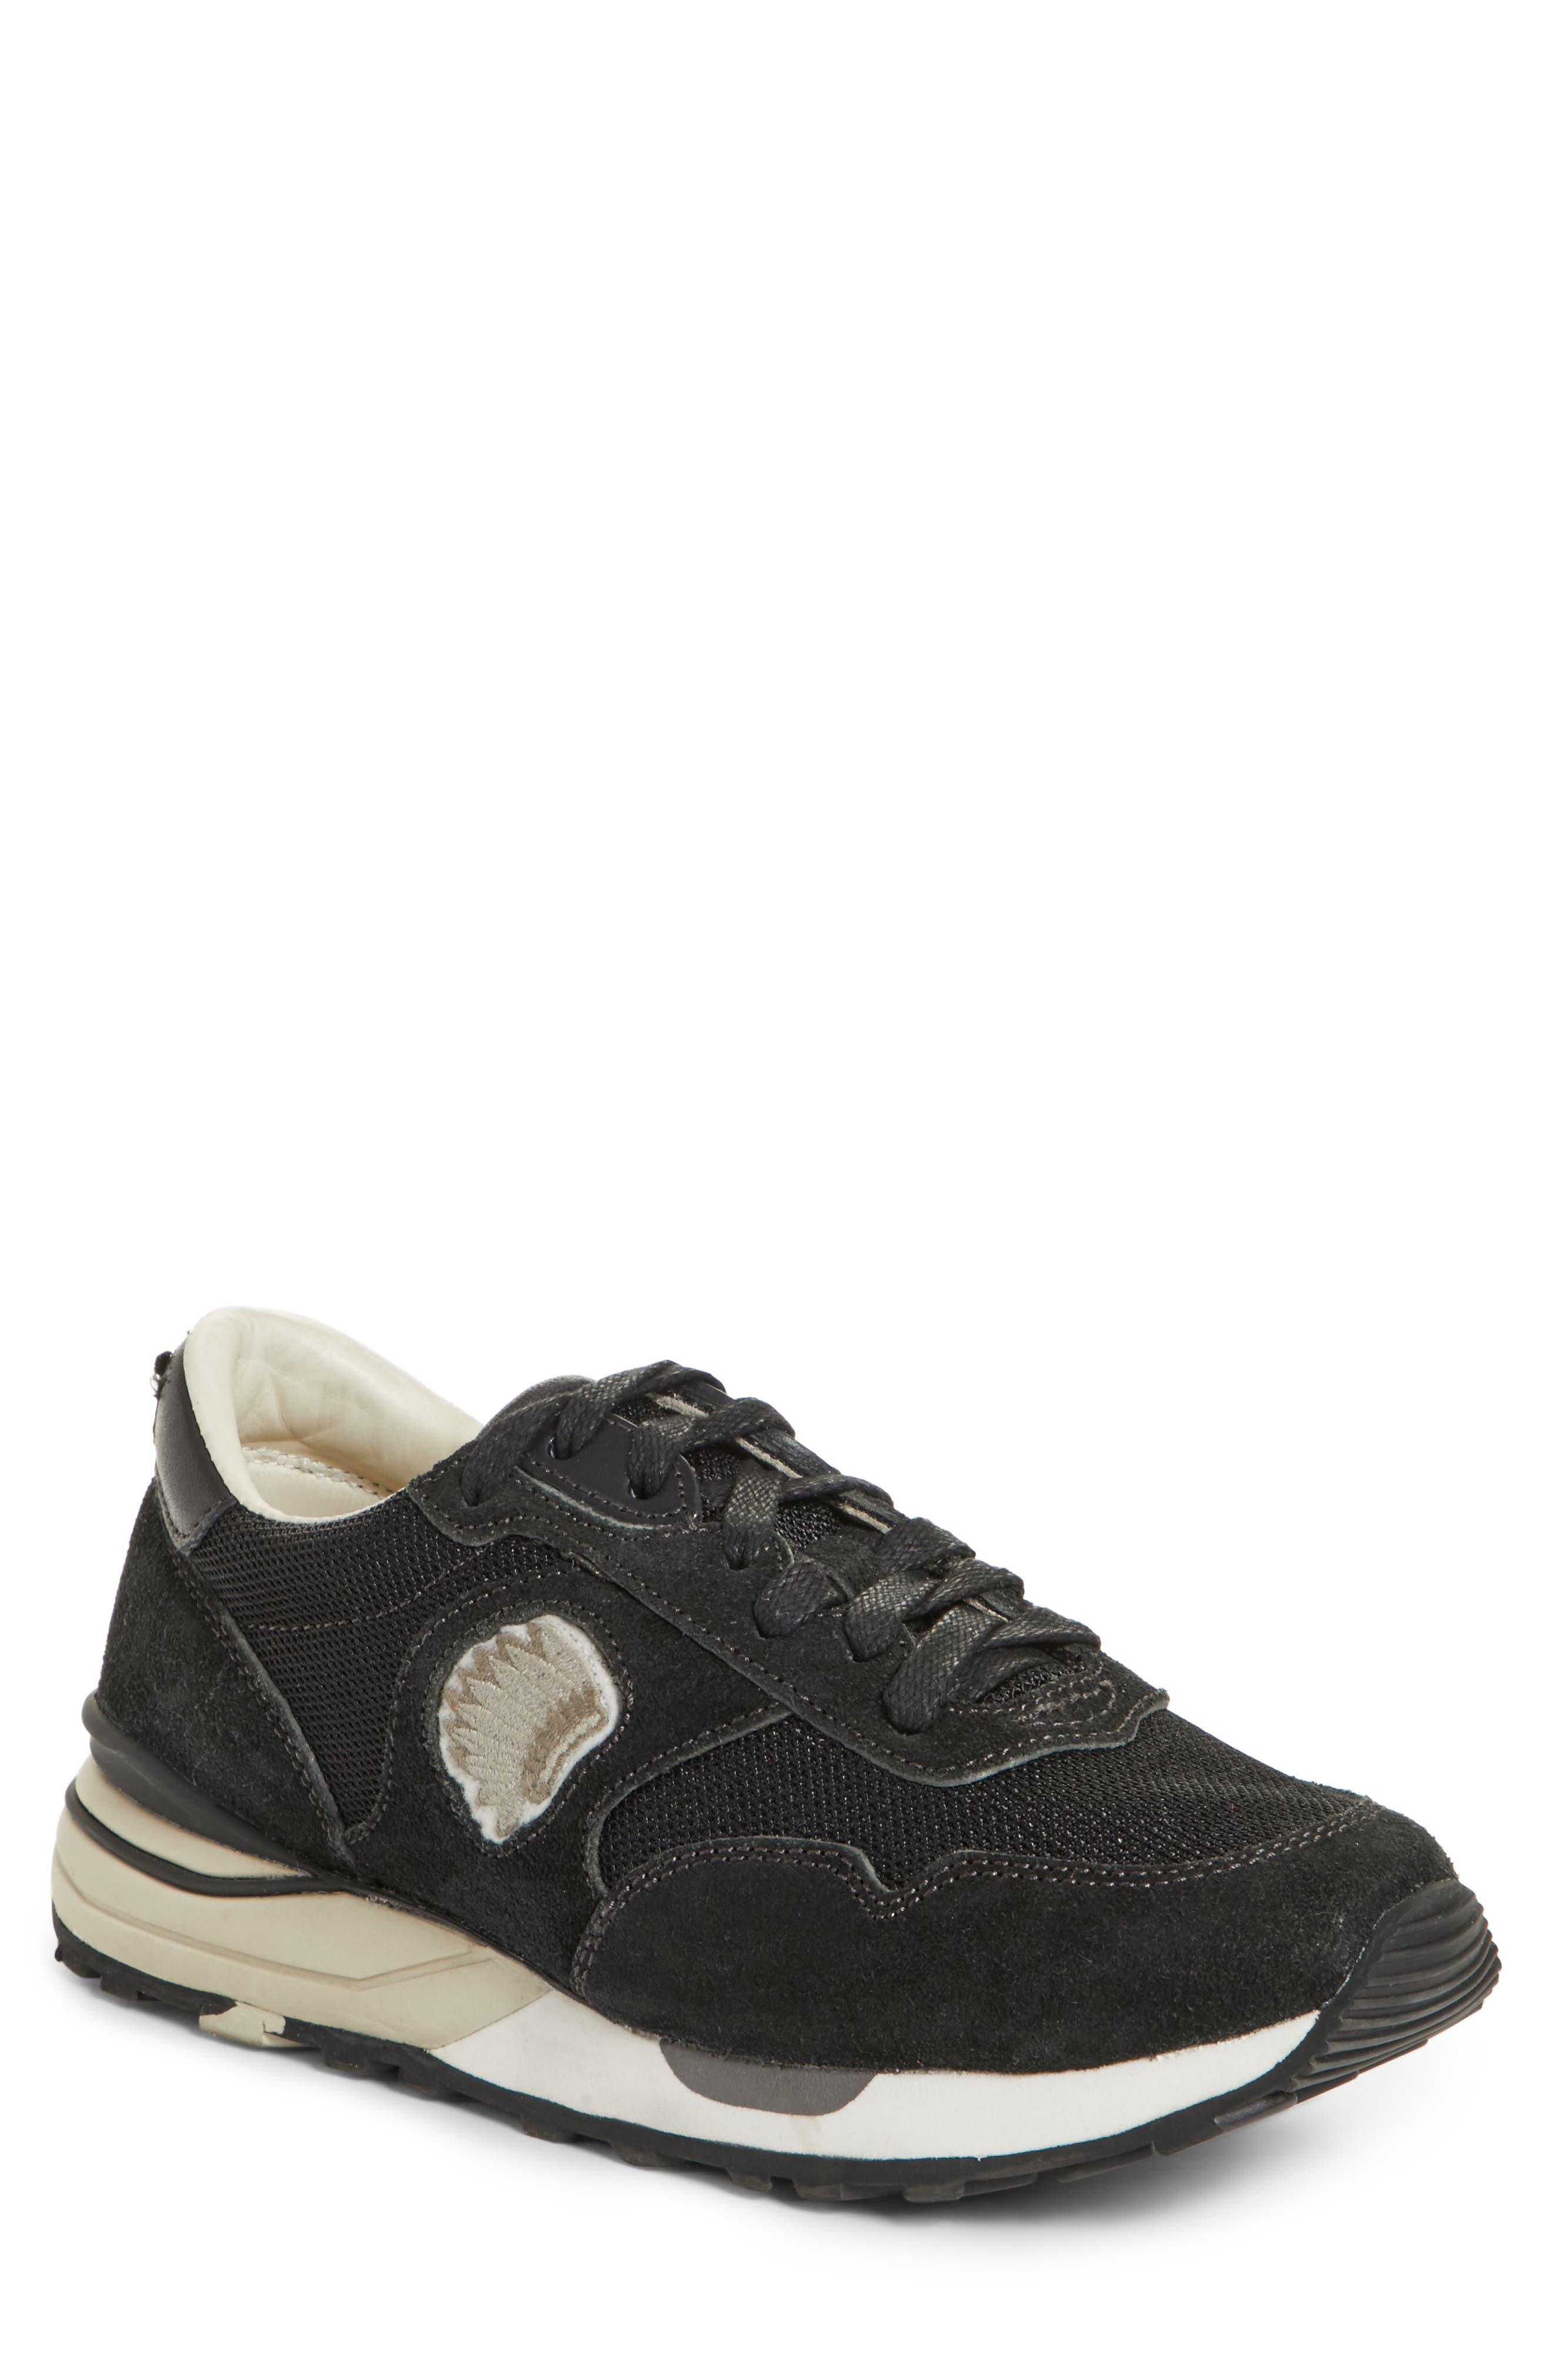 Roland Jogger Sneaker,                             Main thumbnail 1, color,                             002